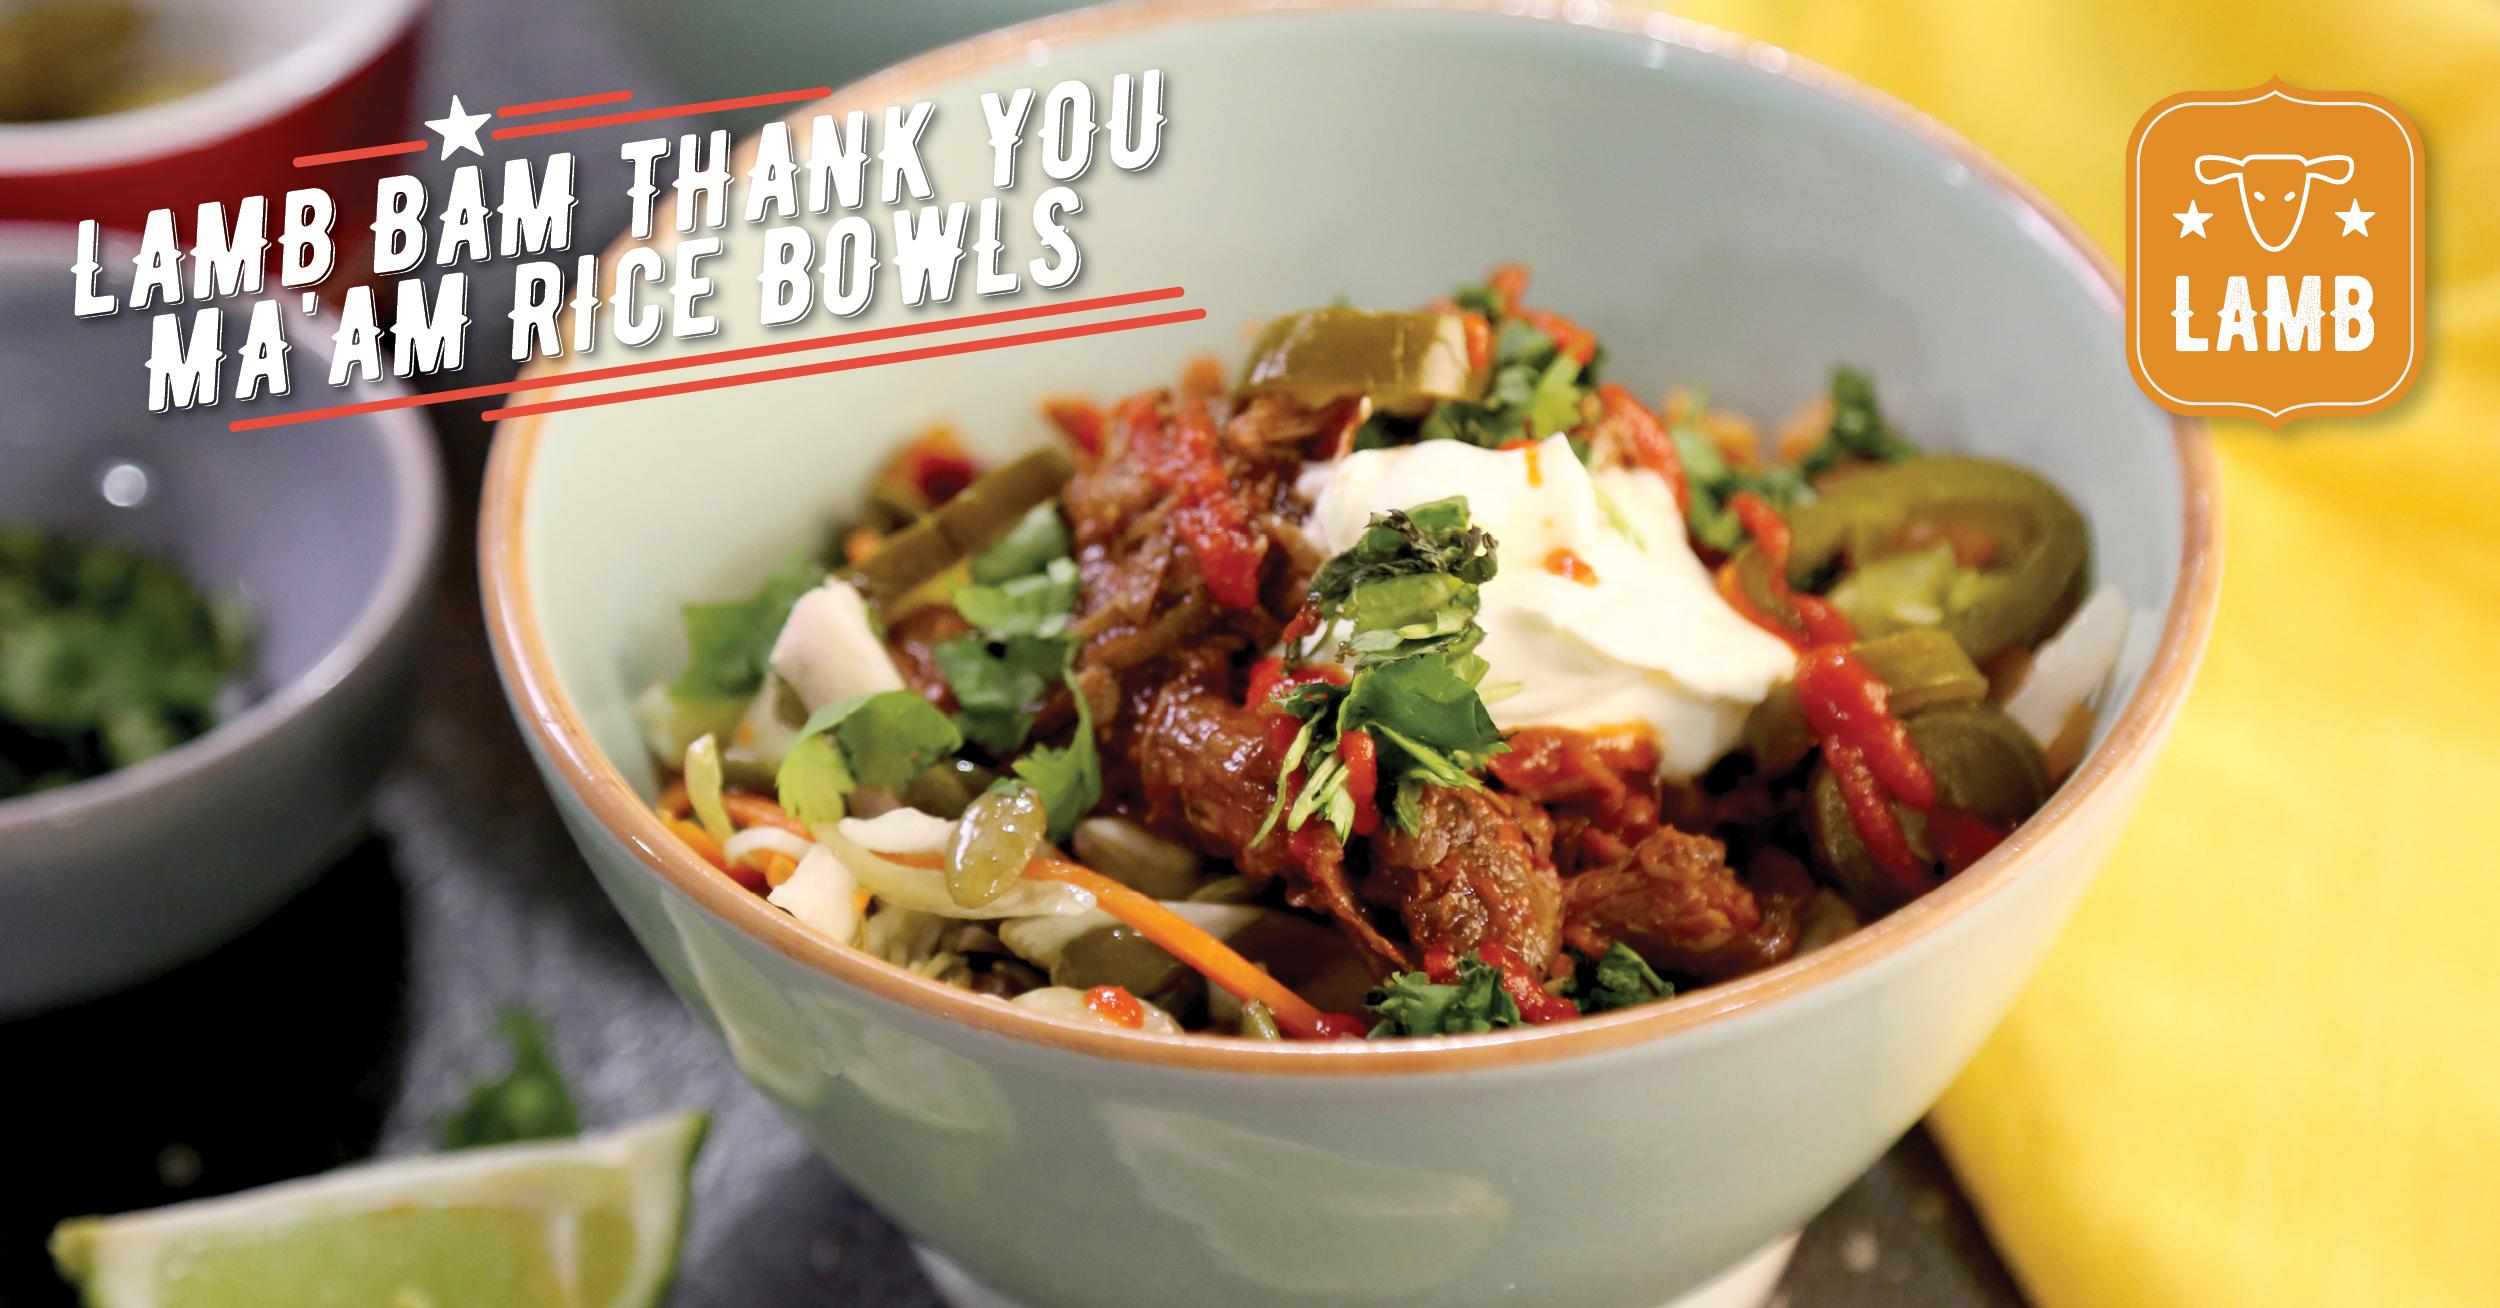 Lamb Bam Thank You Ma'am Rice Bowls